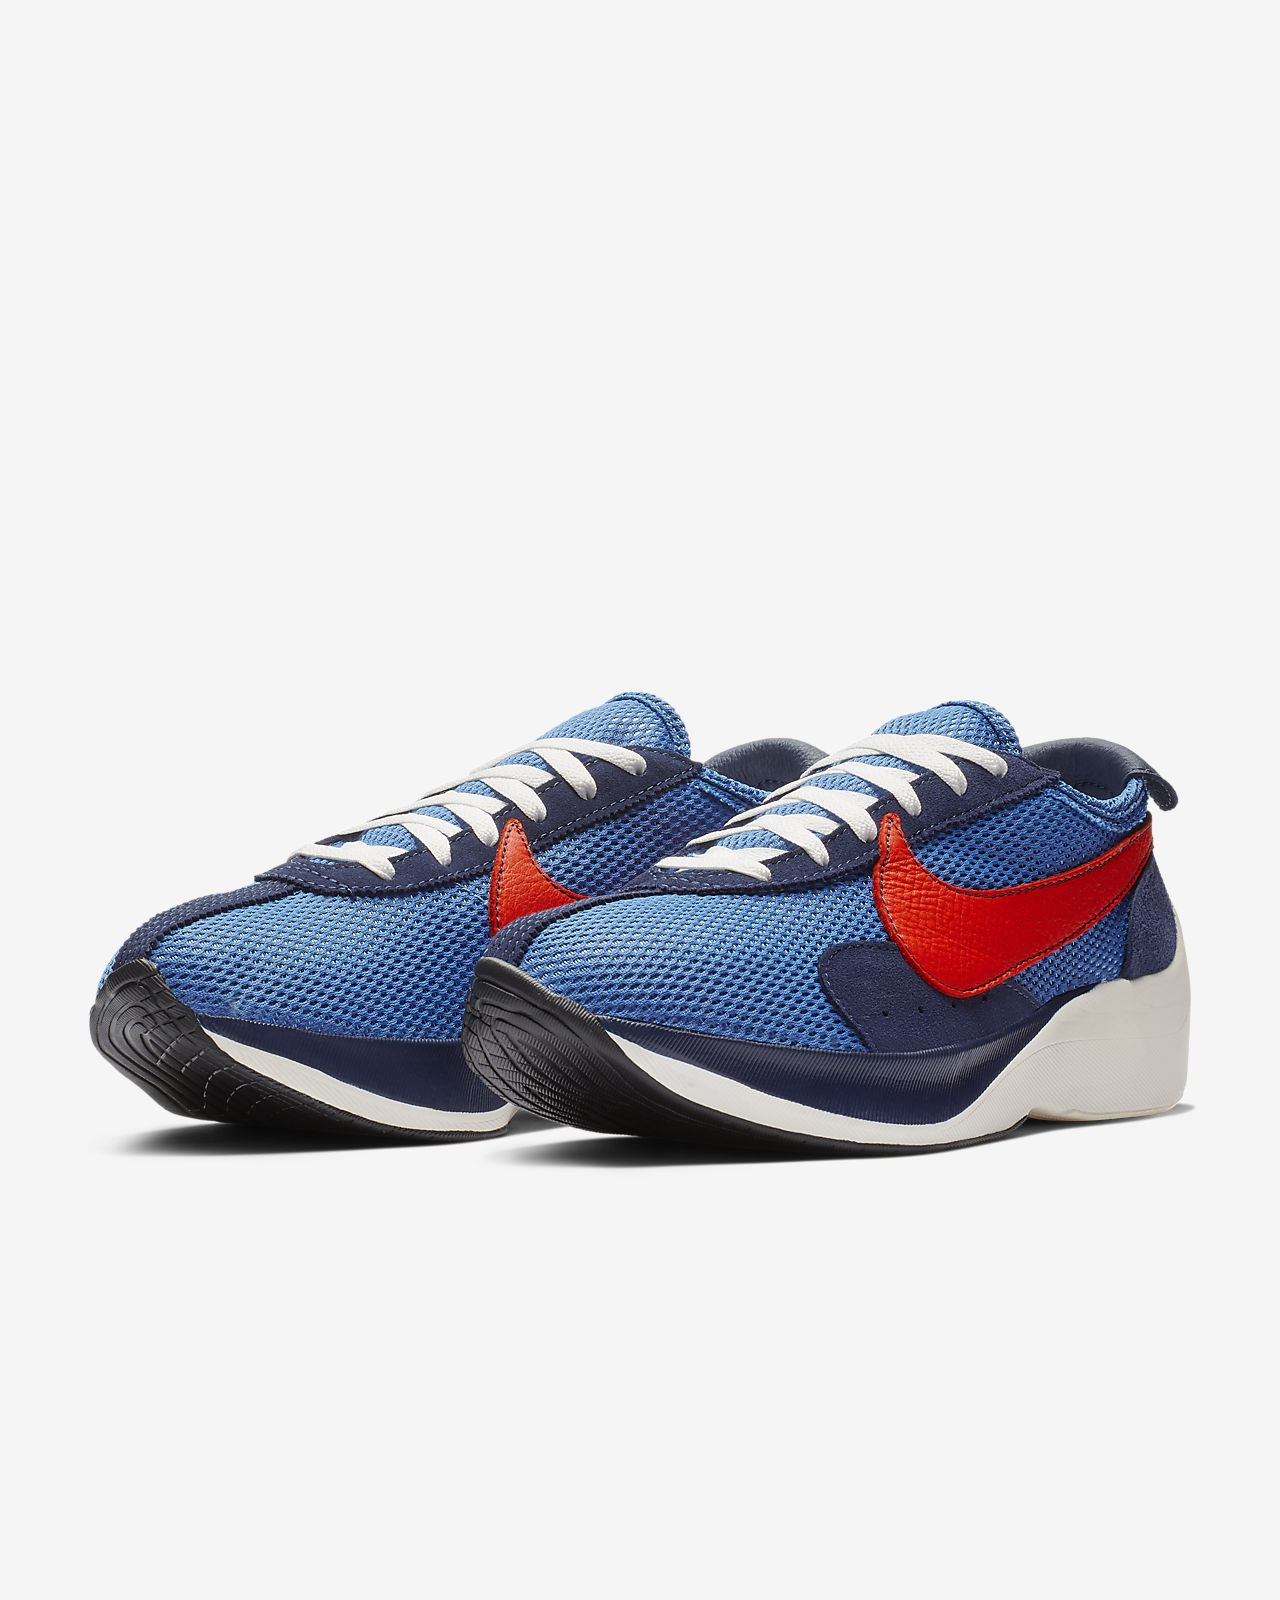 size 40 88793 40663 ... Nike Moon Racer QS Men s Shoe